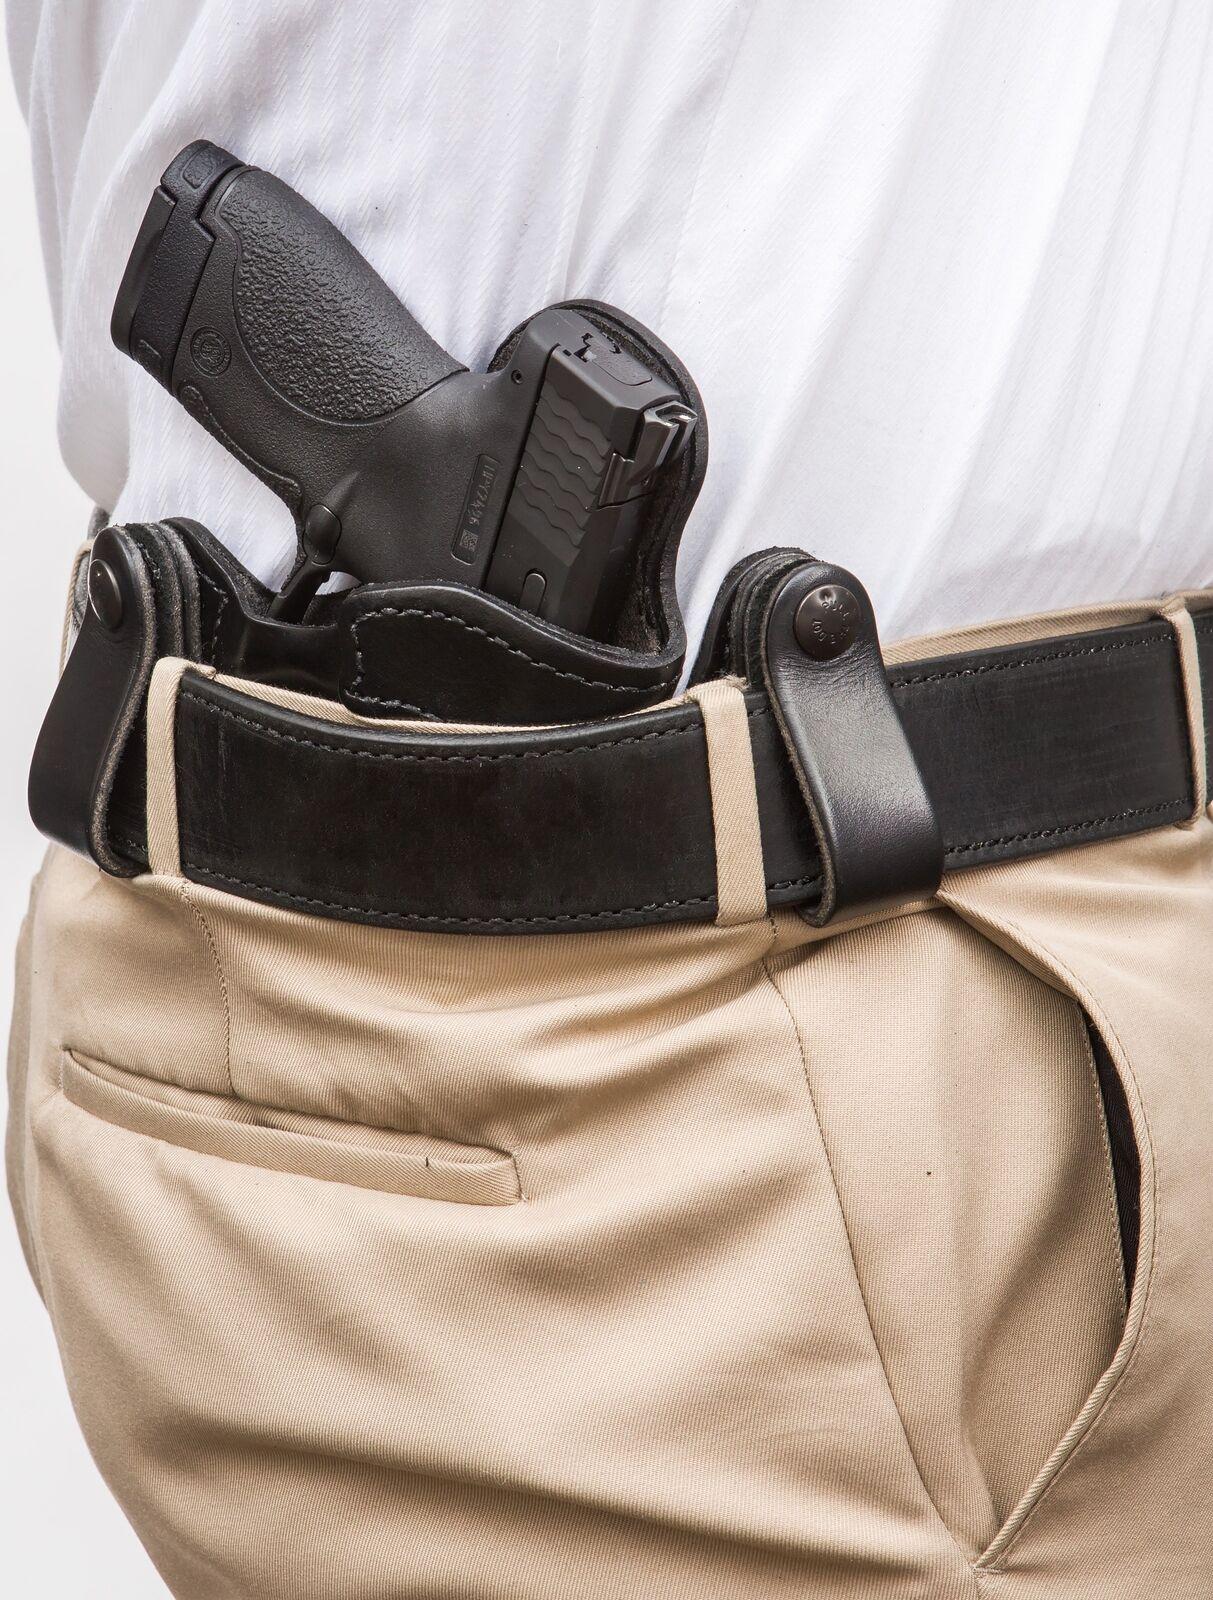 XTREME CARRY RH LH IWB Leder Gun Gun Gun Holster For CZ P09 d09efa